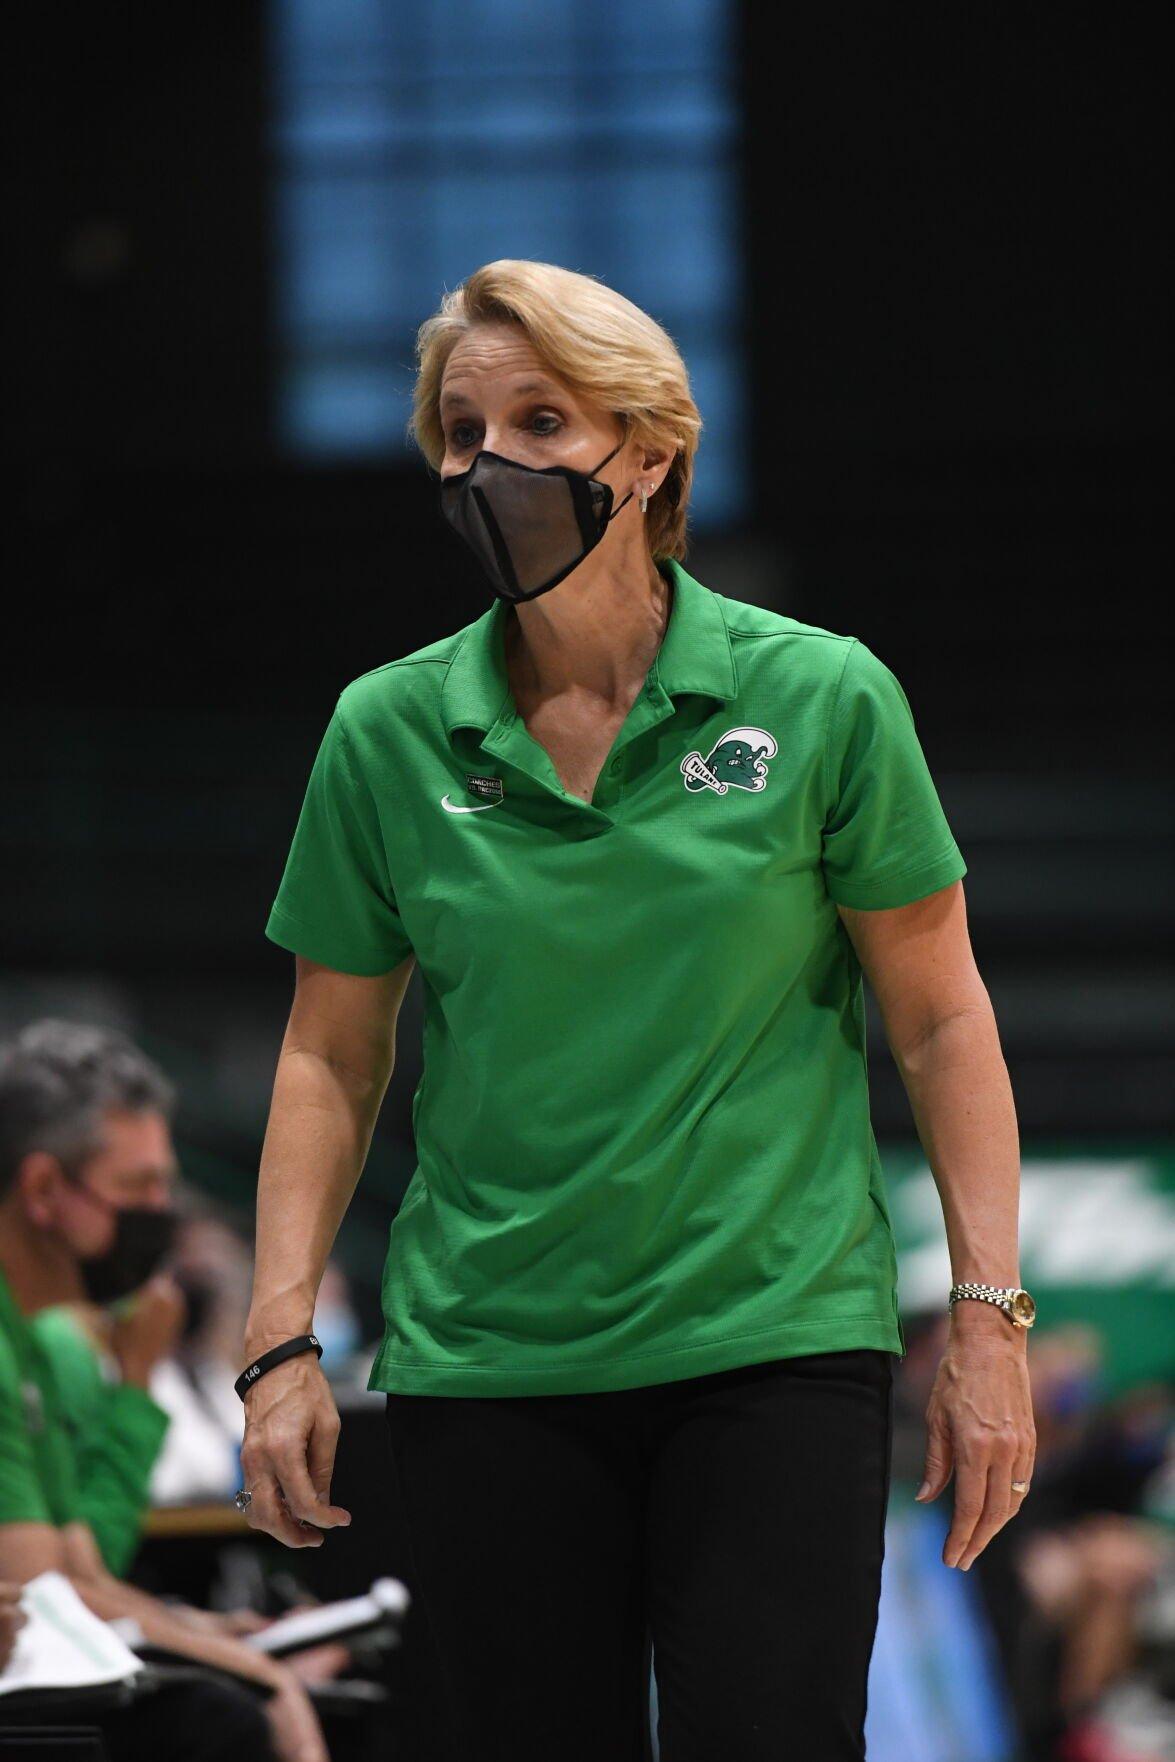 Lisa Stockton